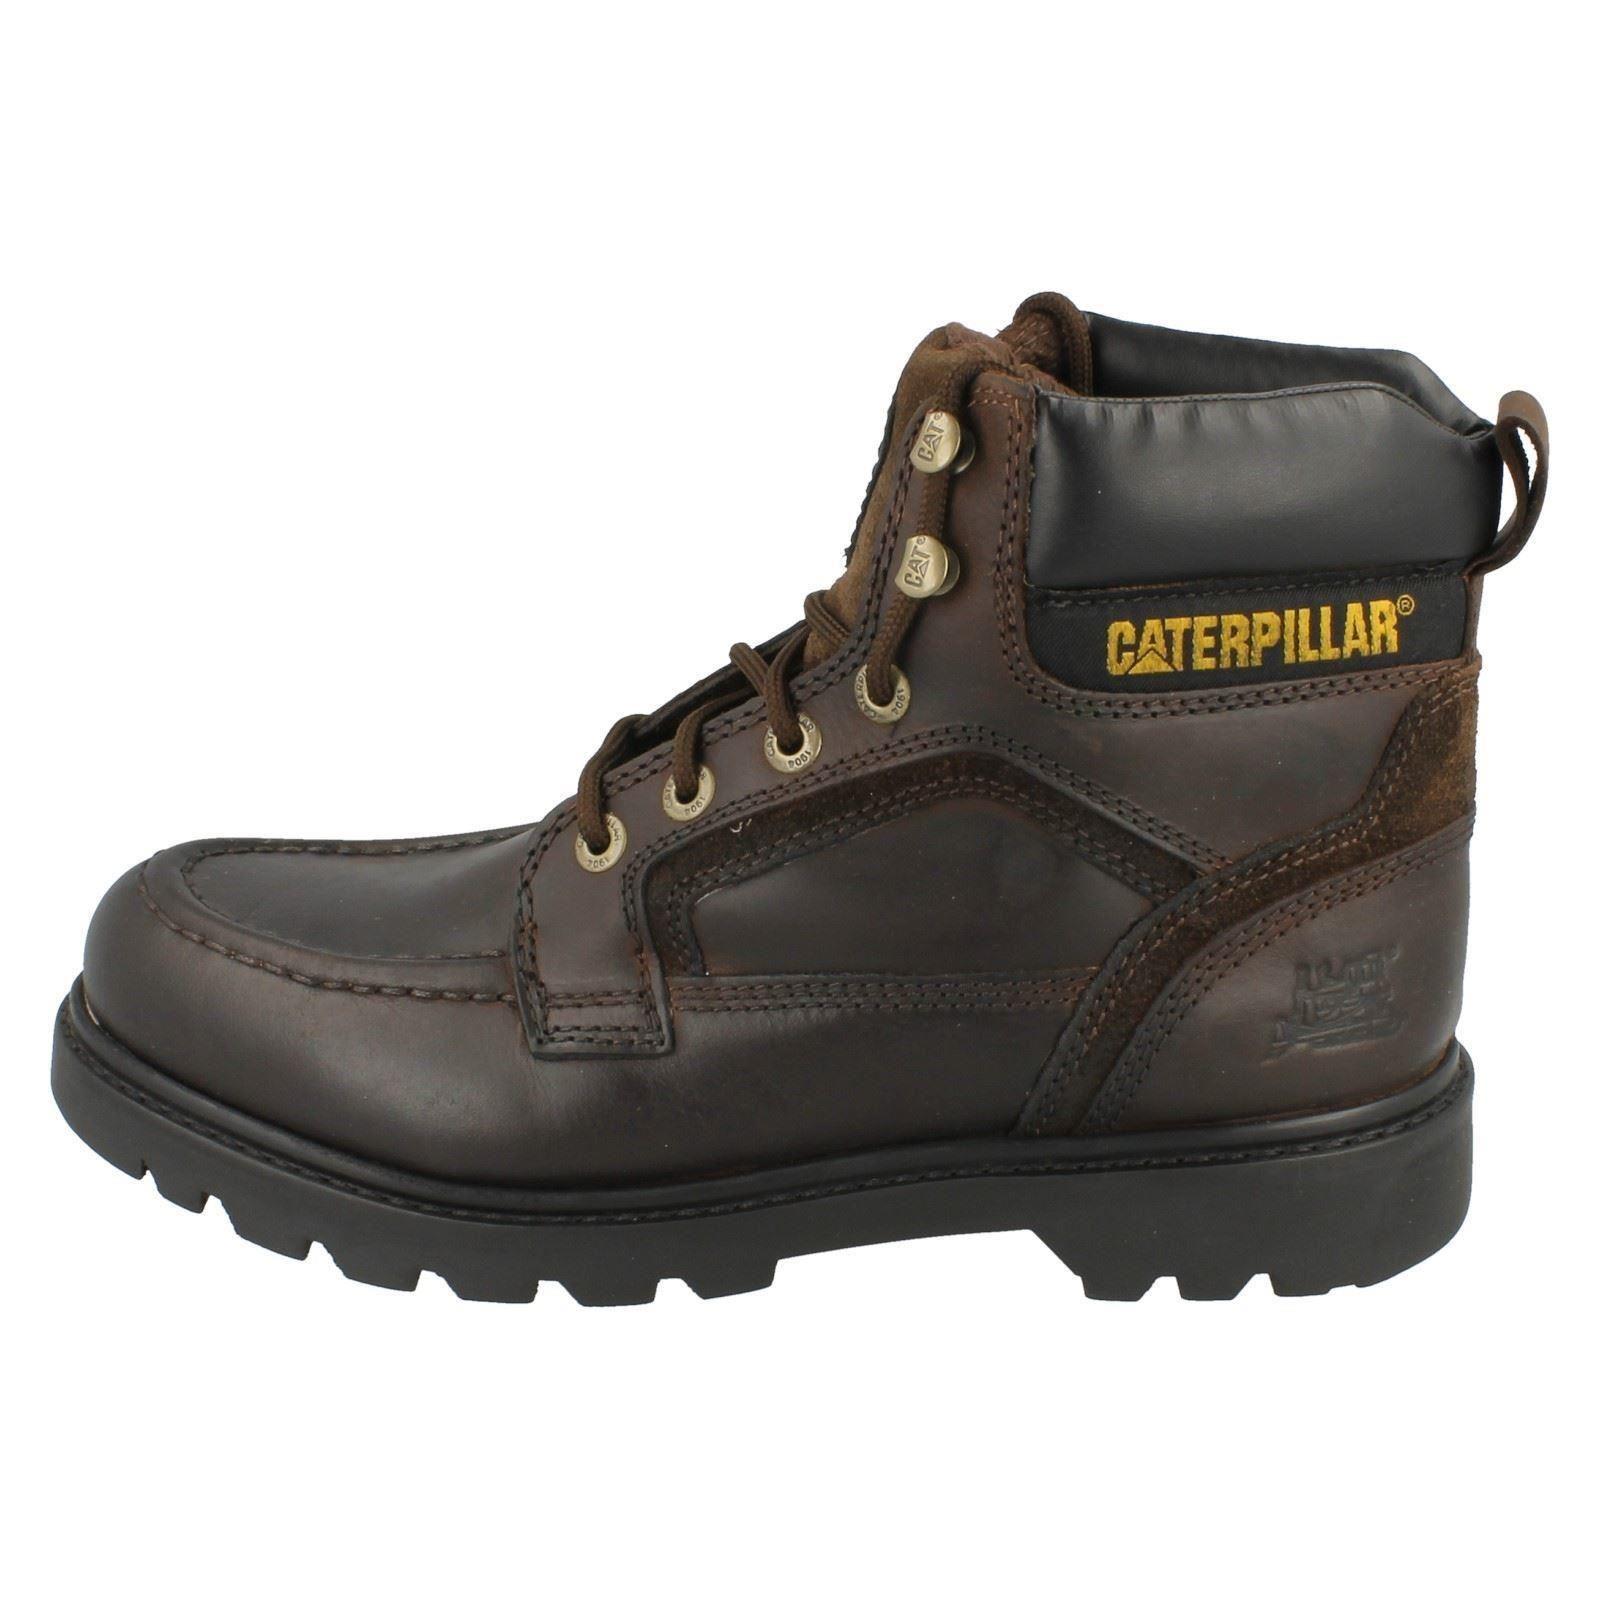 Uomo Transpose Caterpillar Boot Style - Transpose Uomo e99323